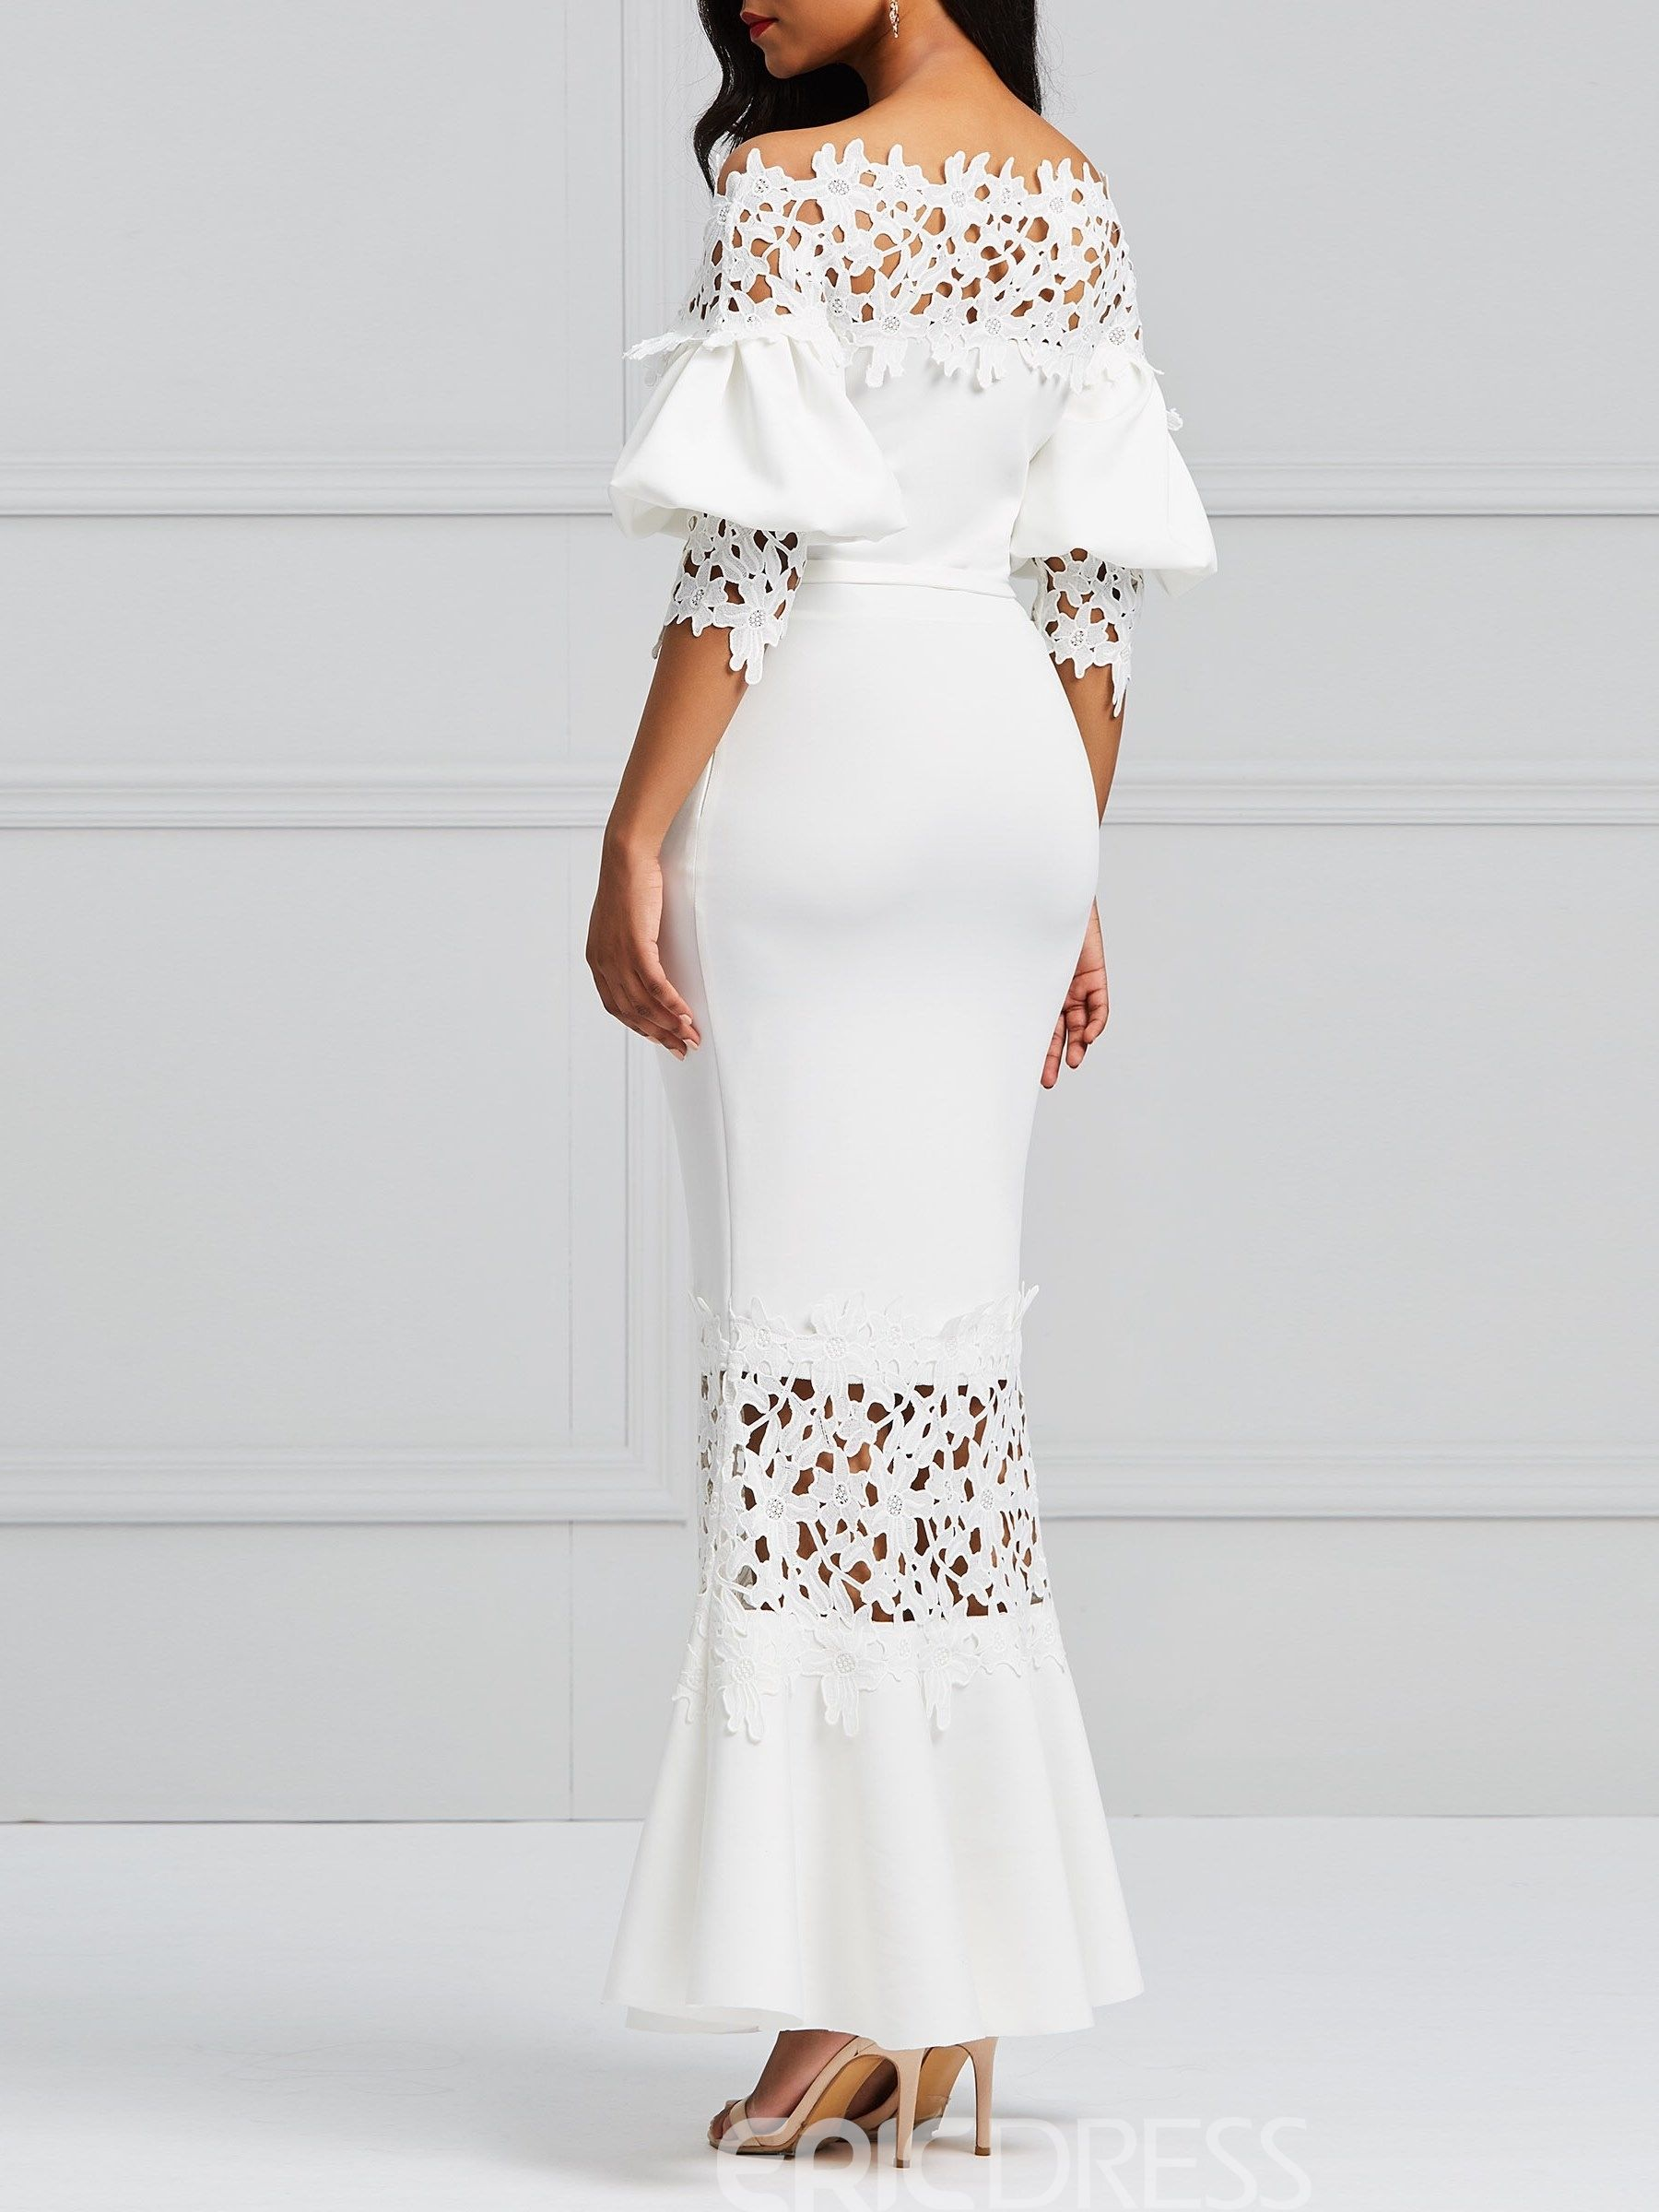 4d4a701a93e43 Ericdress White Slash Lantern Sleeve Neck Lace Maxi Dress | جديد in ...